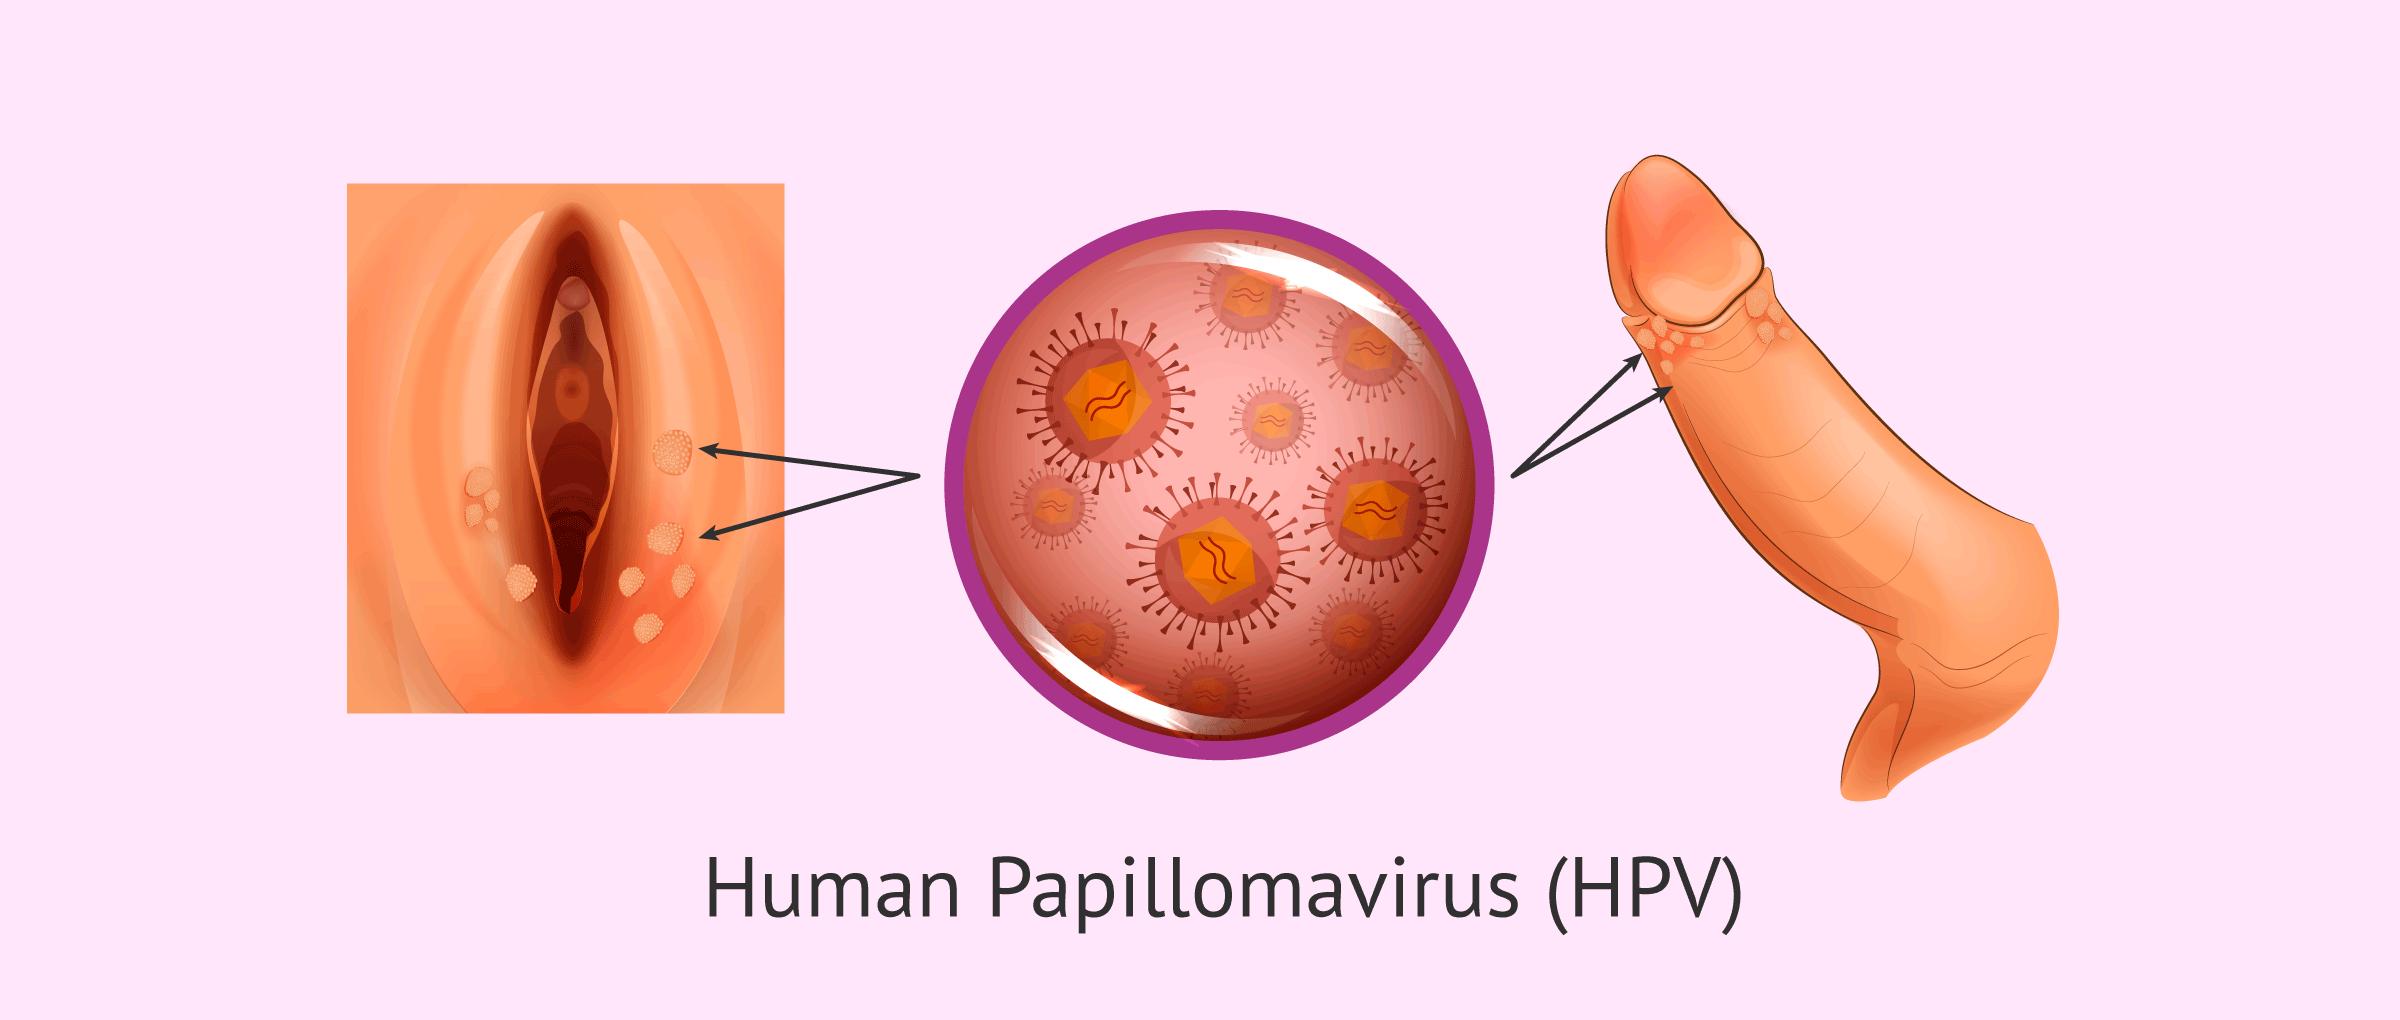 what does human papillomavirus cause